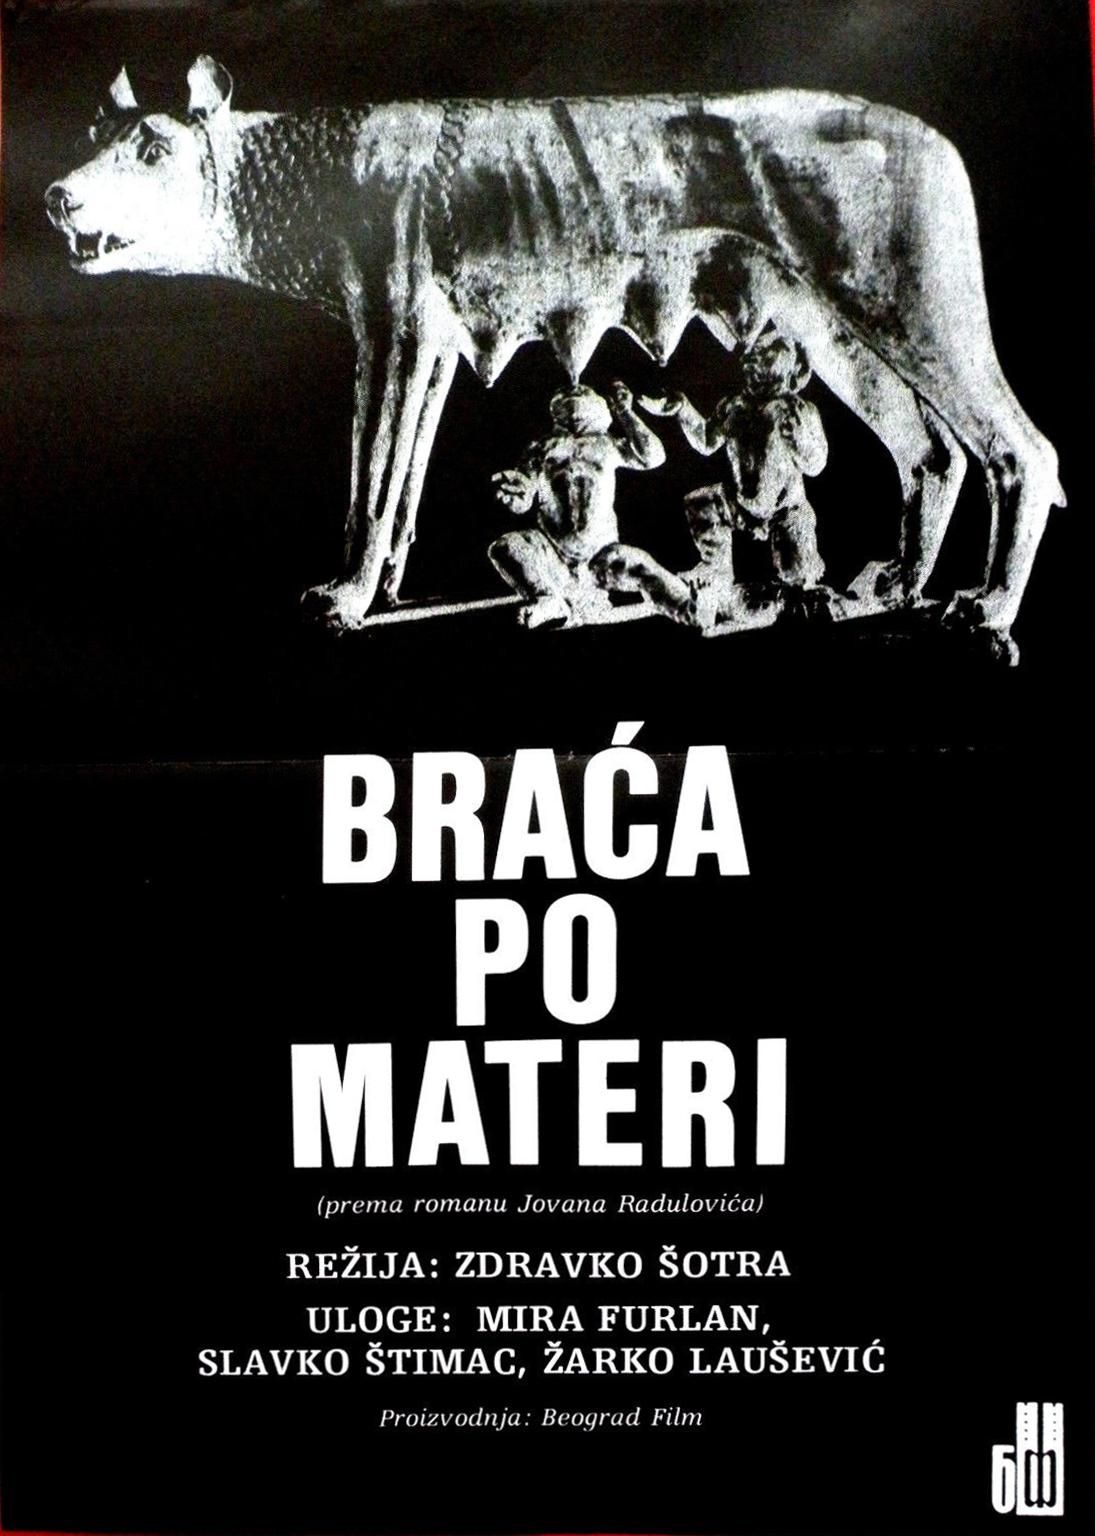 Braca po materi (1988)